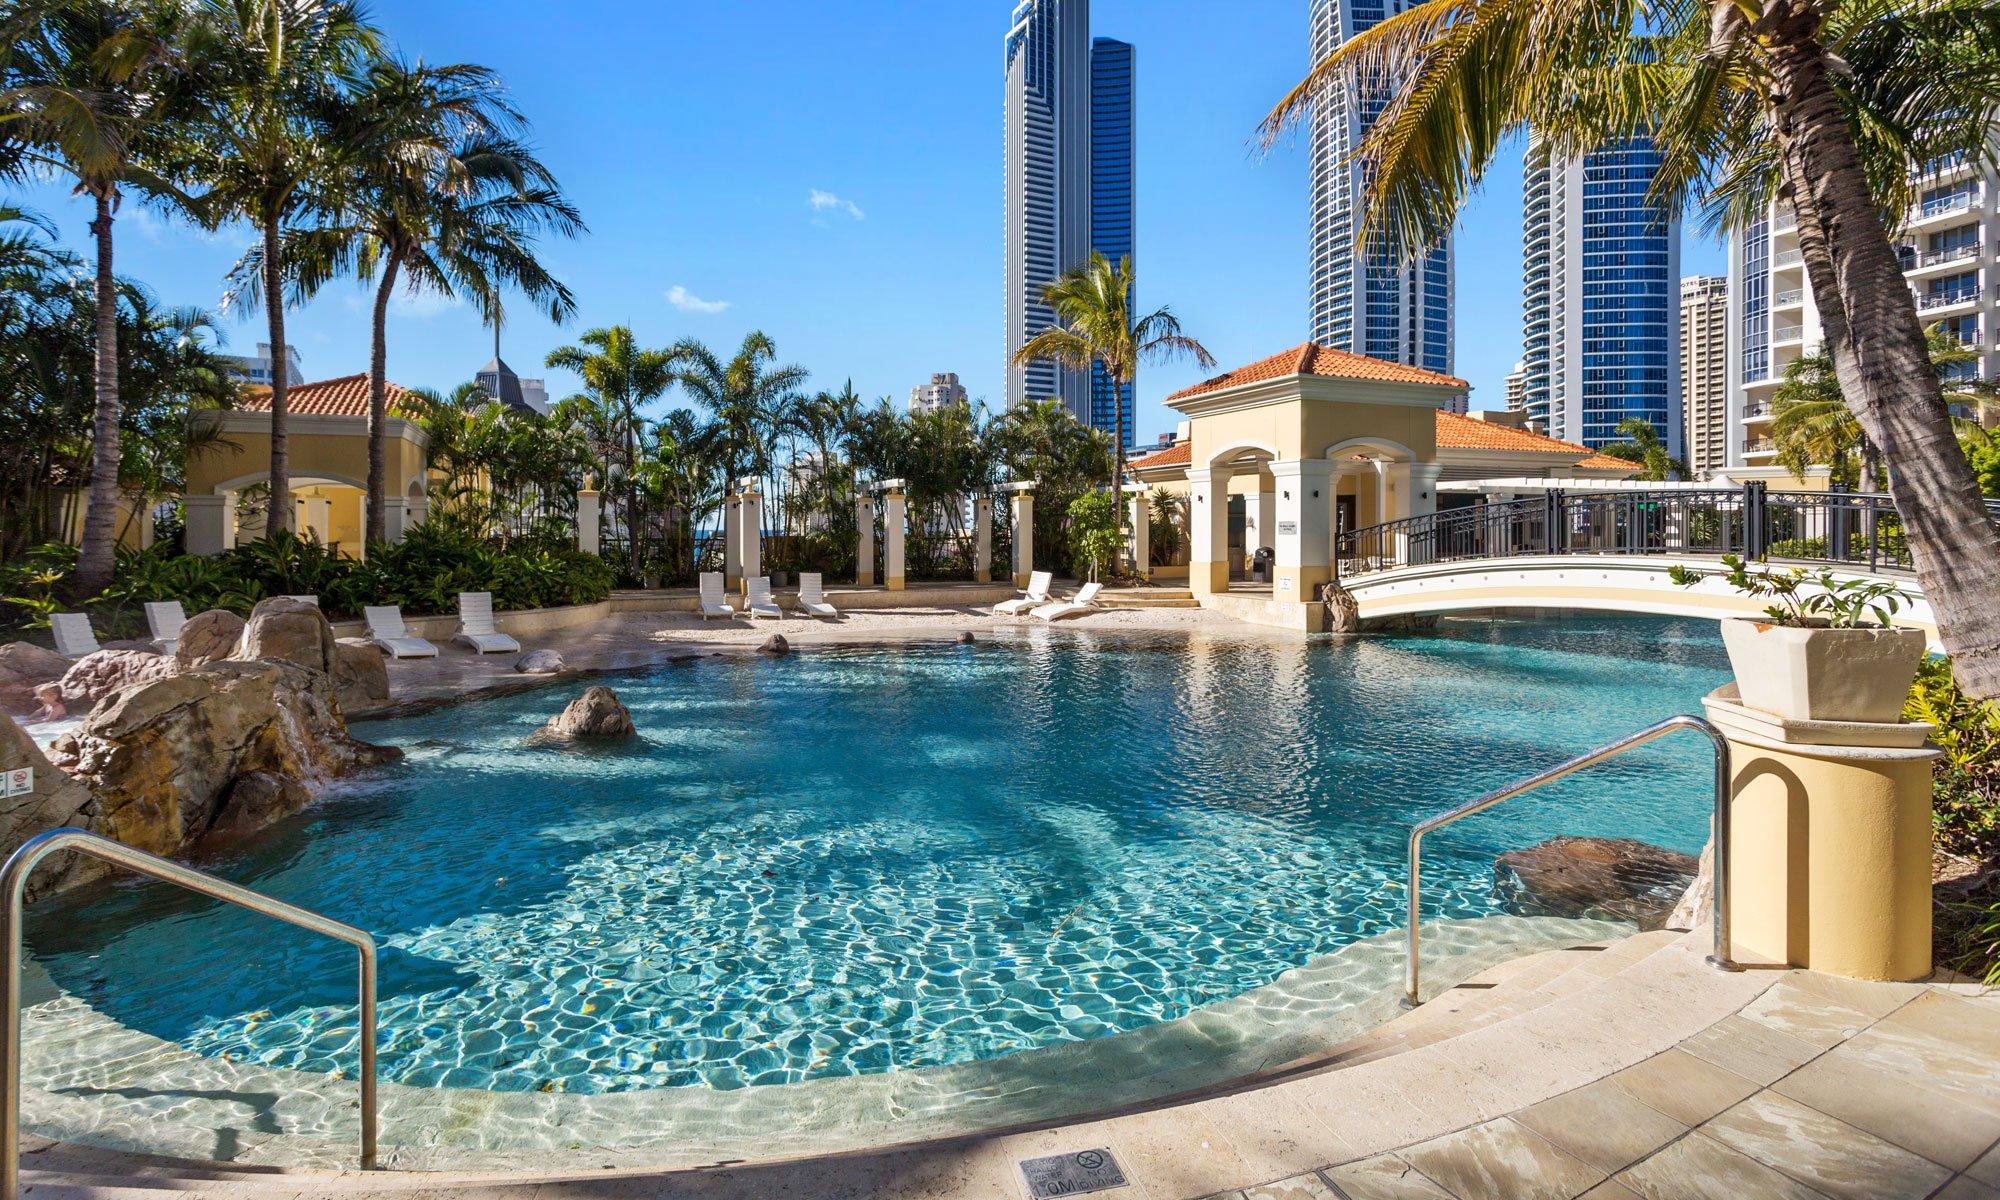 Gold Coast real estate for sale Chevron Renaissance sandy lagoon beach